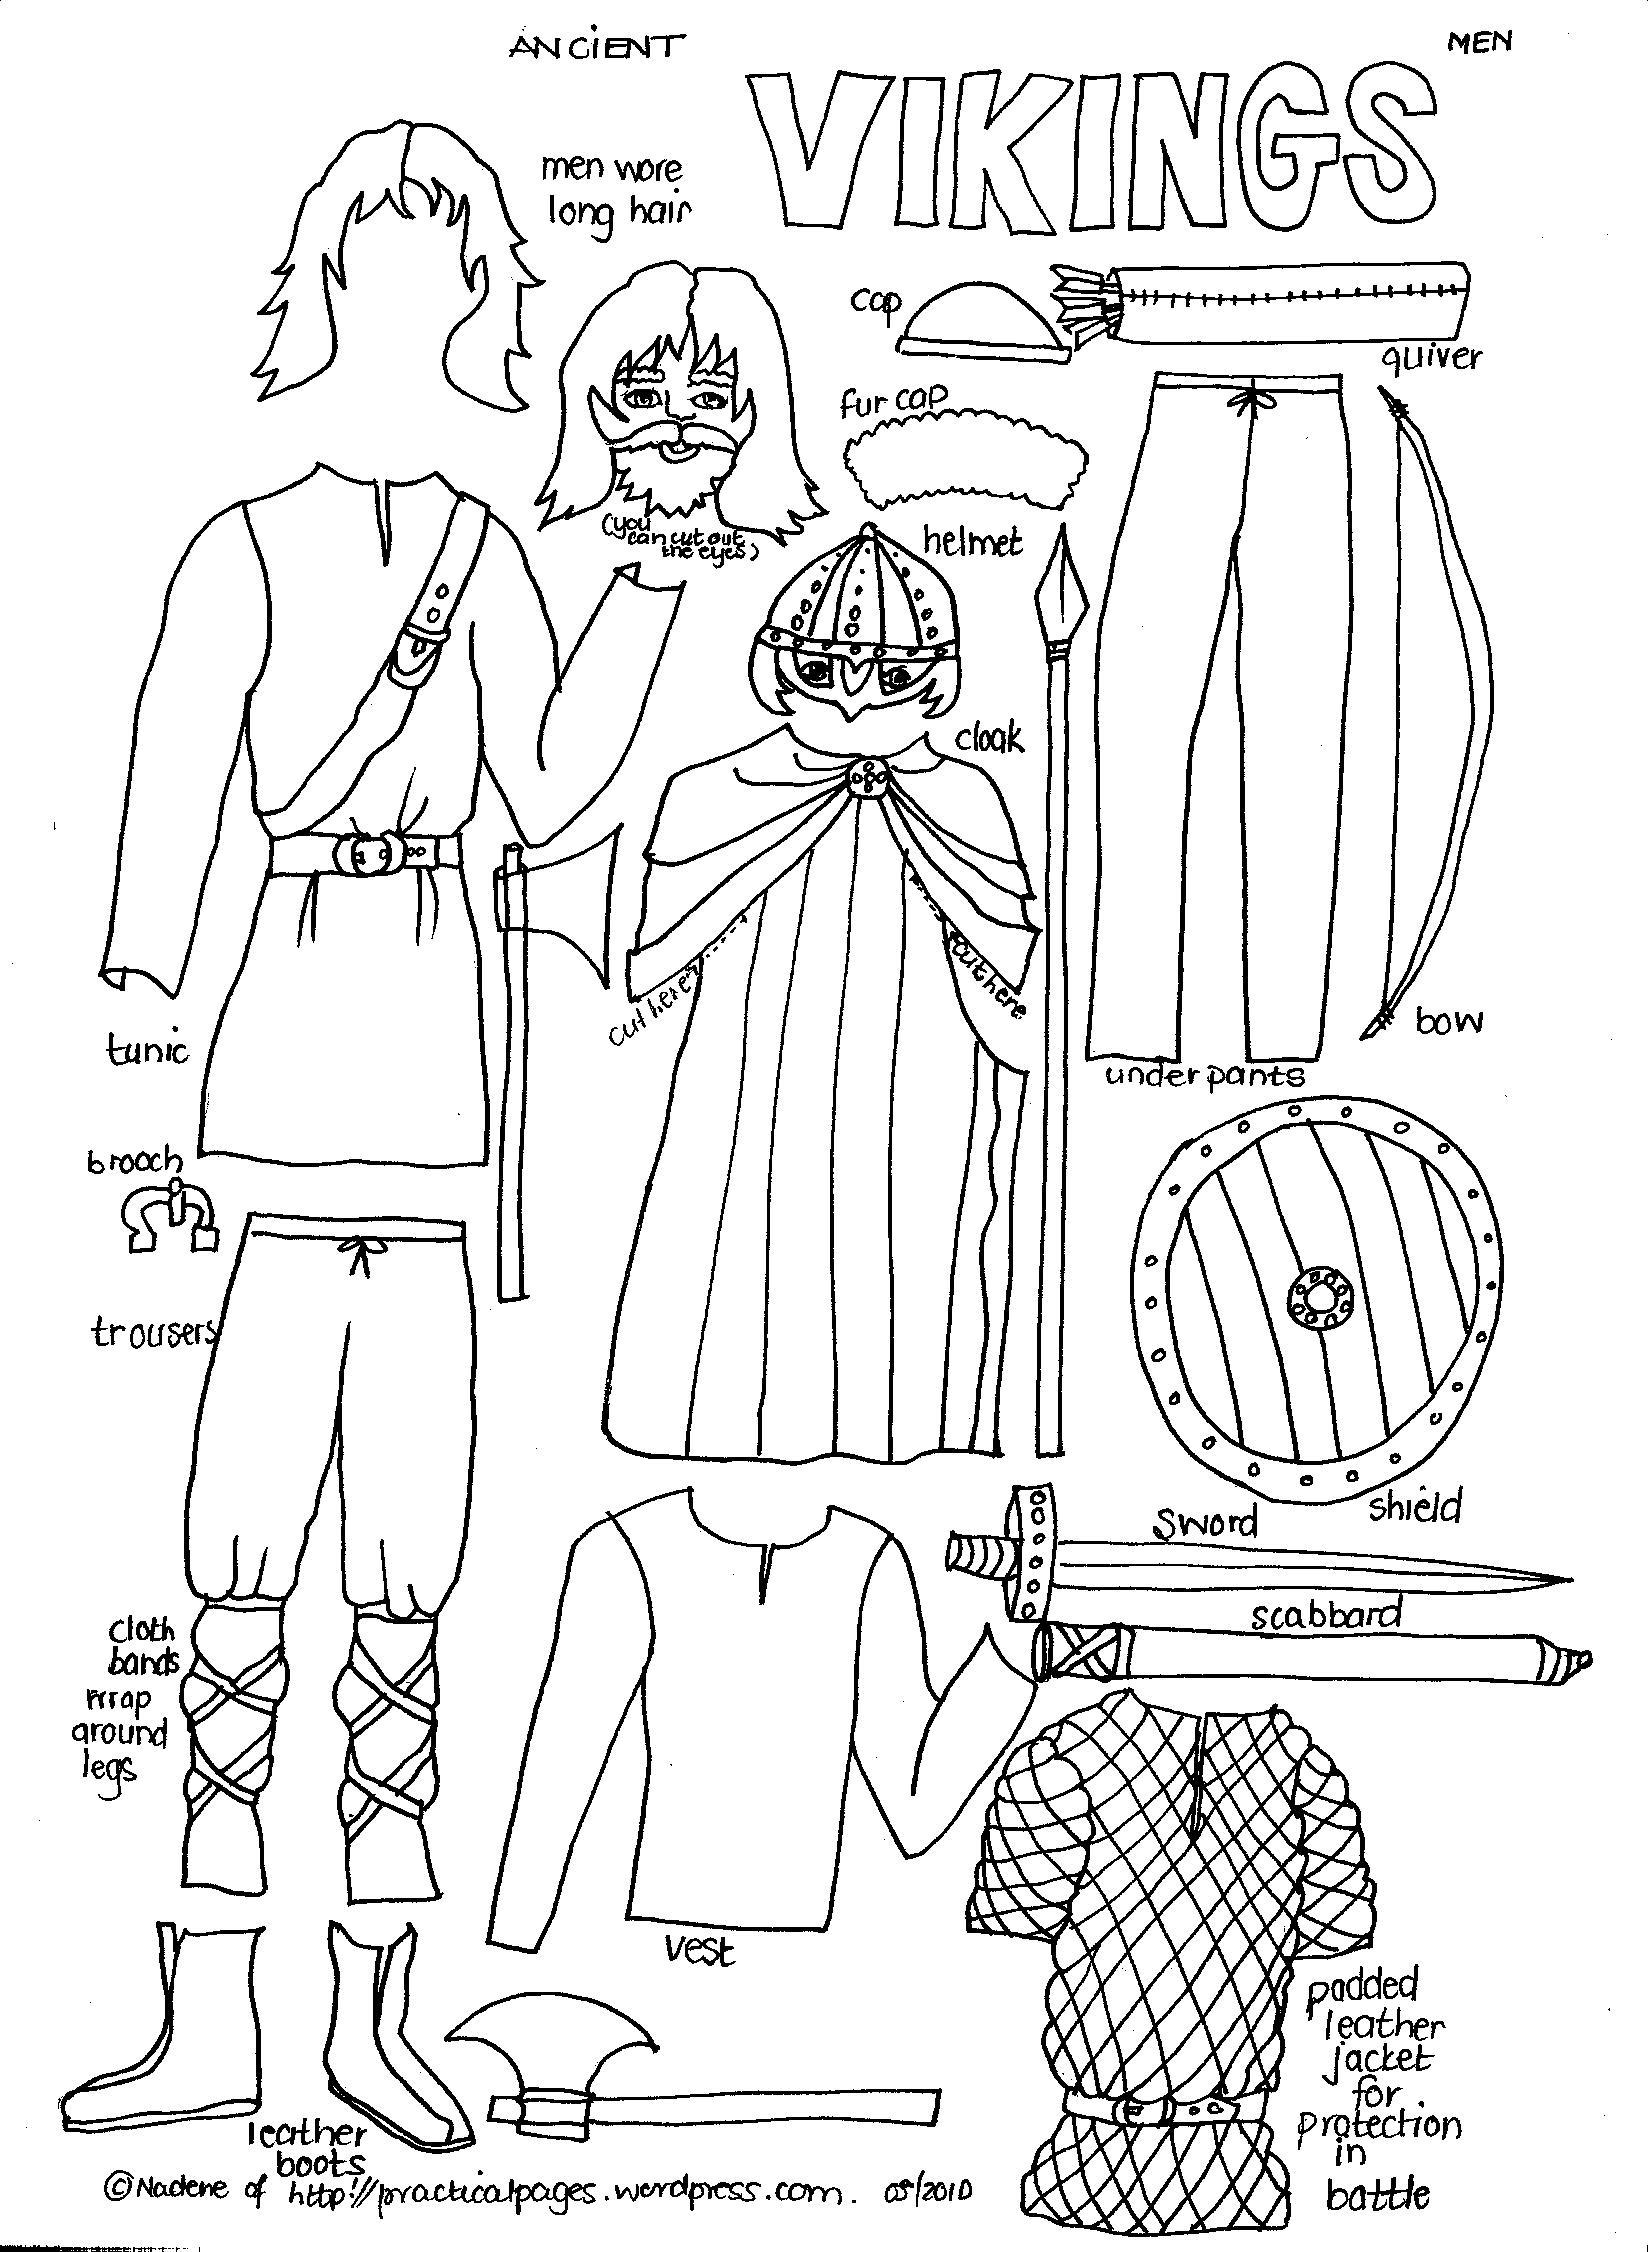 Ancient Viking Men